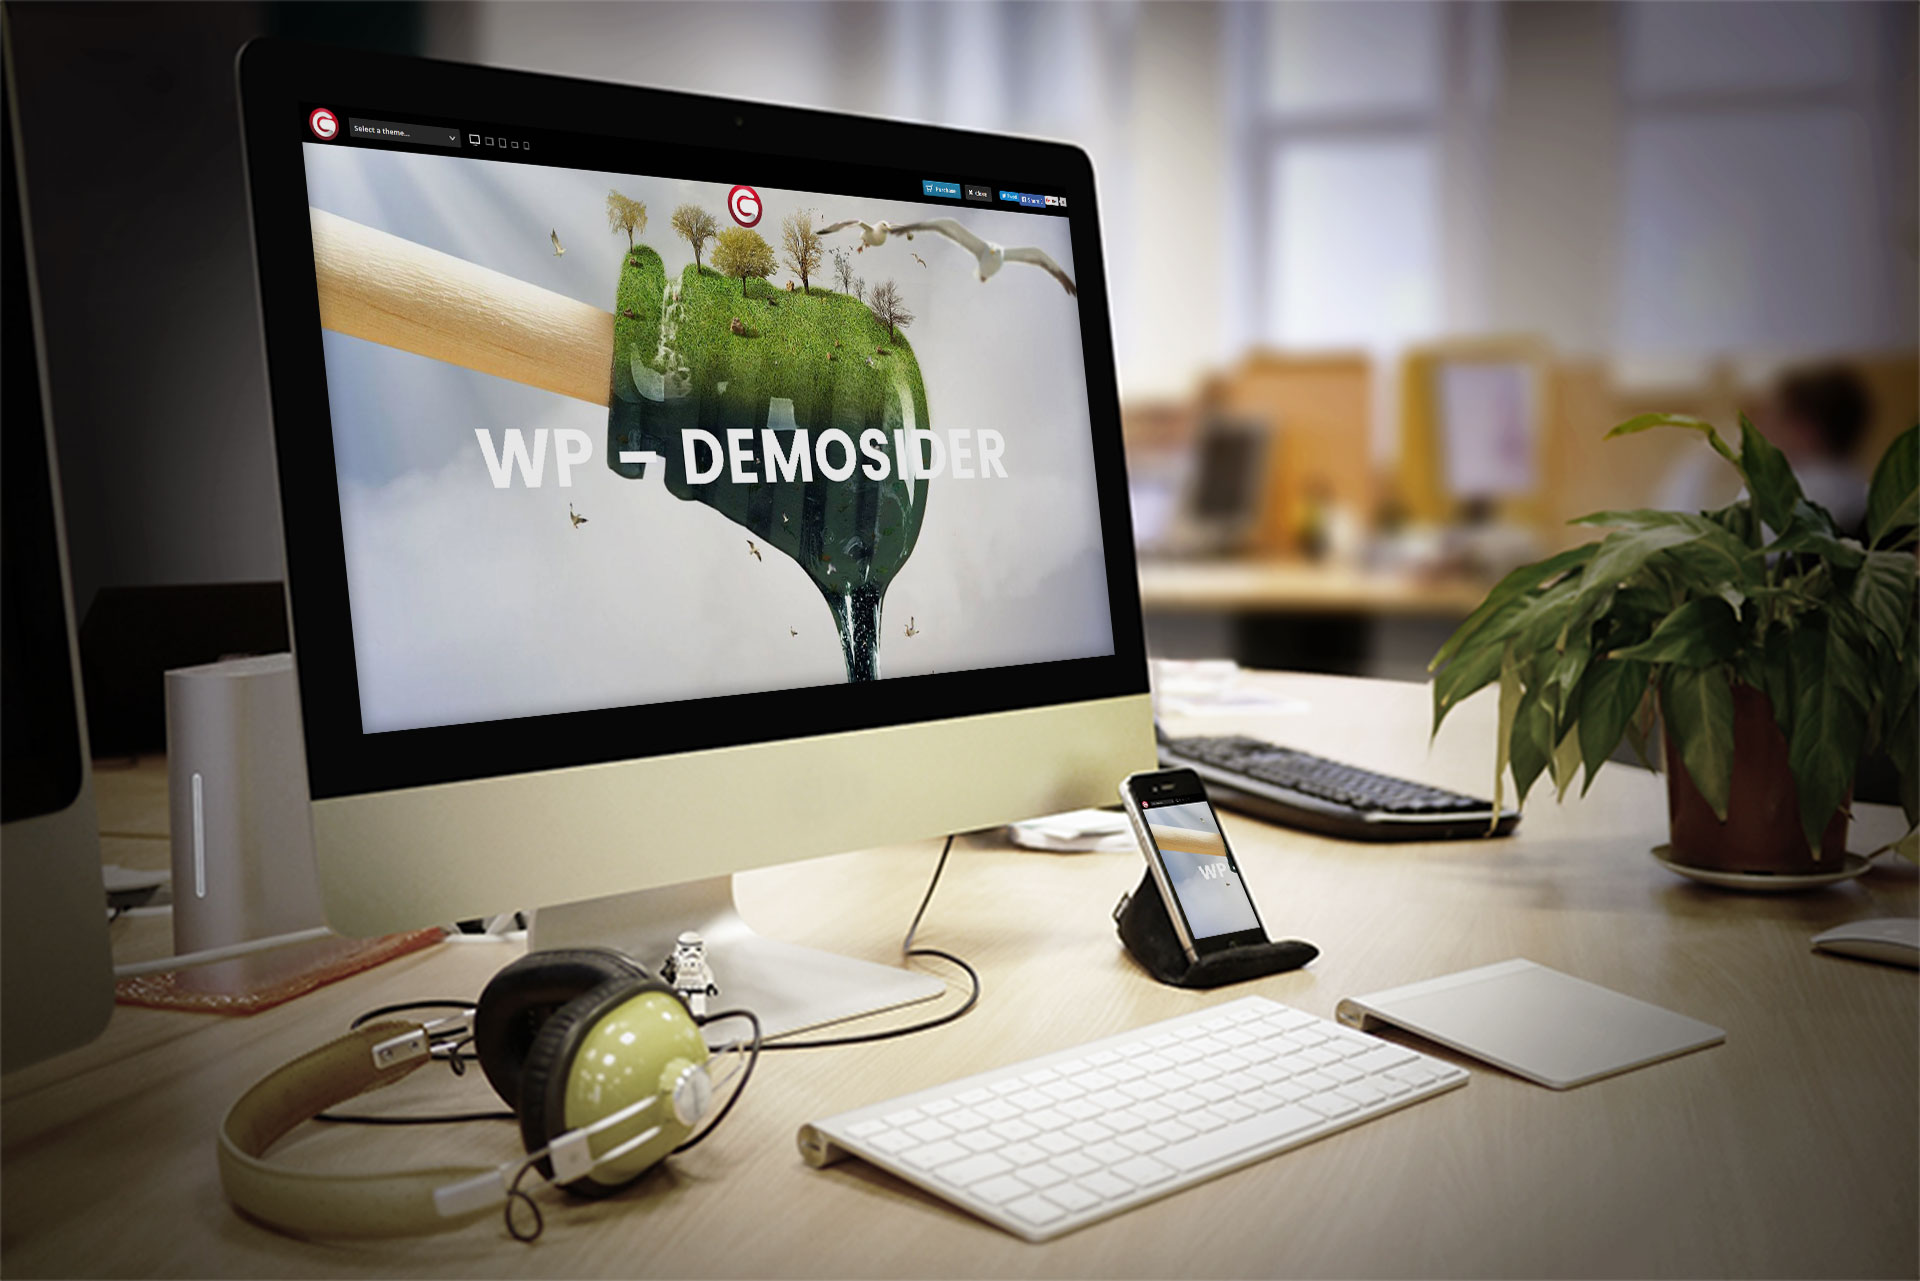 wp-demosider